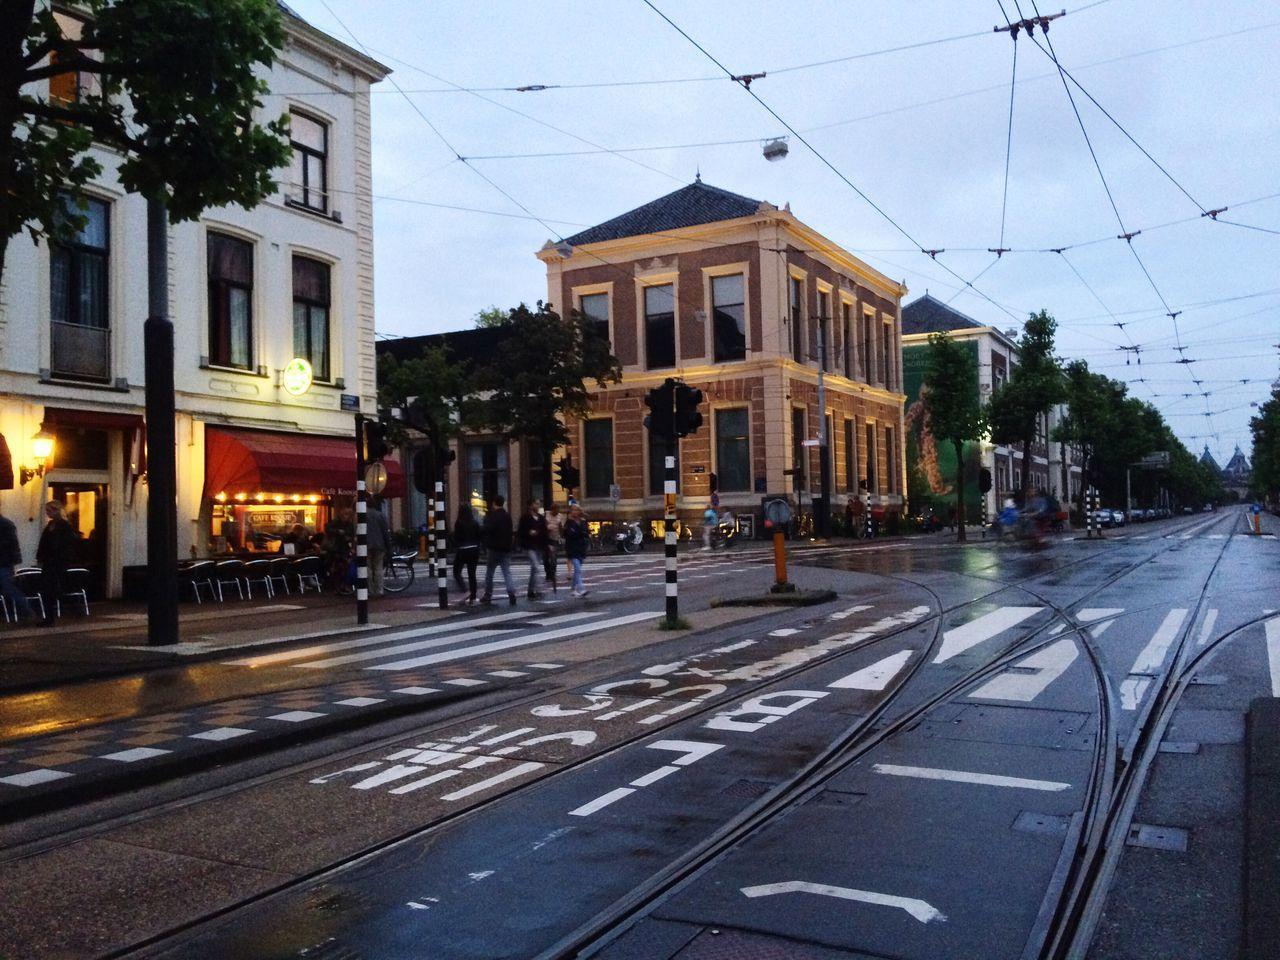 Amsterdam Netherlands City Night Photography Night Lights Road Rainy Days Rain The City Light EyeEmNewHere